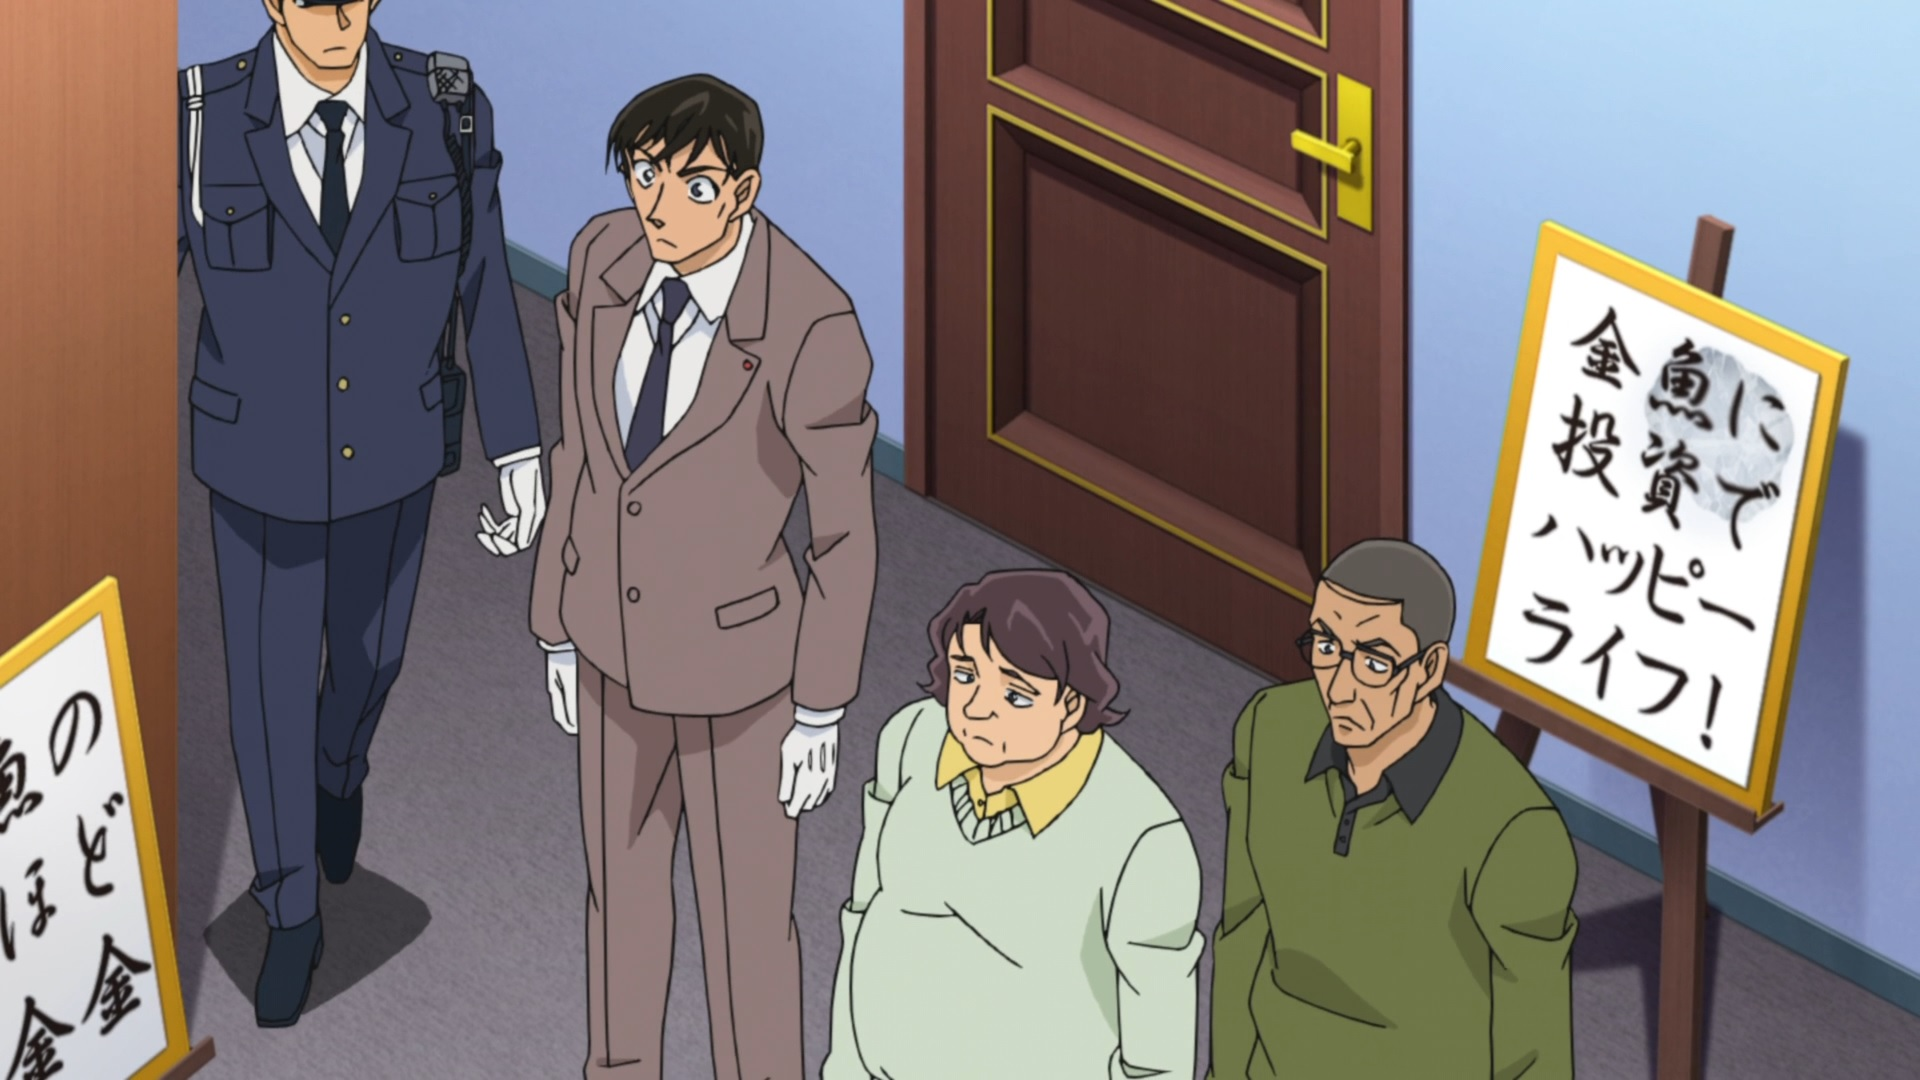 Detektiv-Conan-Episode-977-2